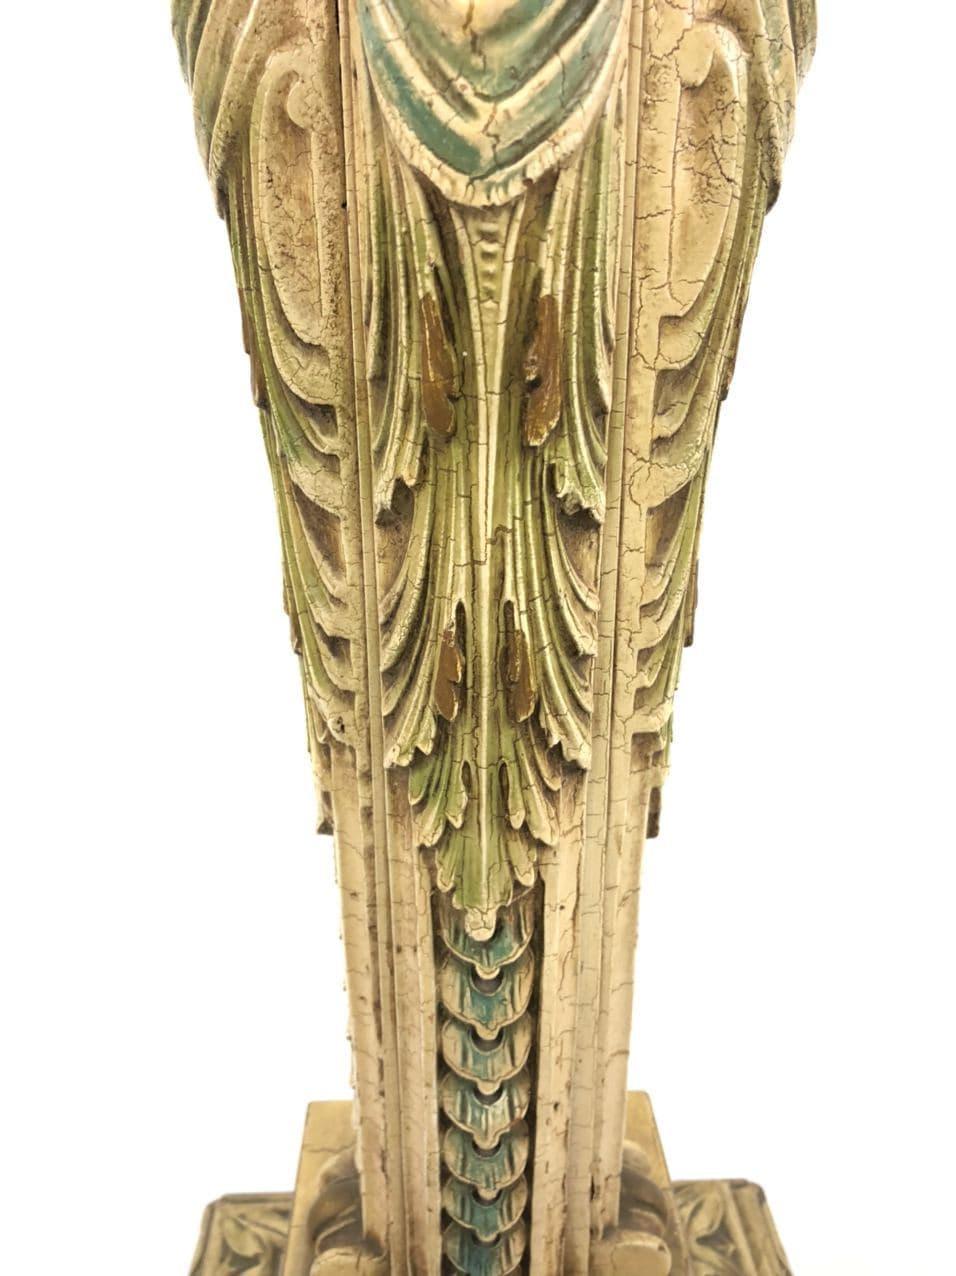 Антикварная подставка в стиле Ренессанс 190302003У